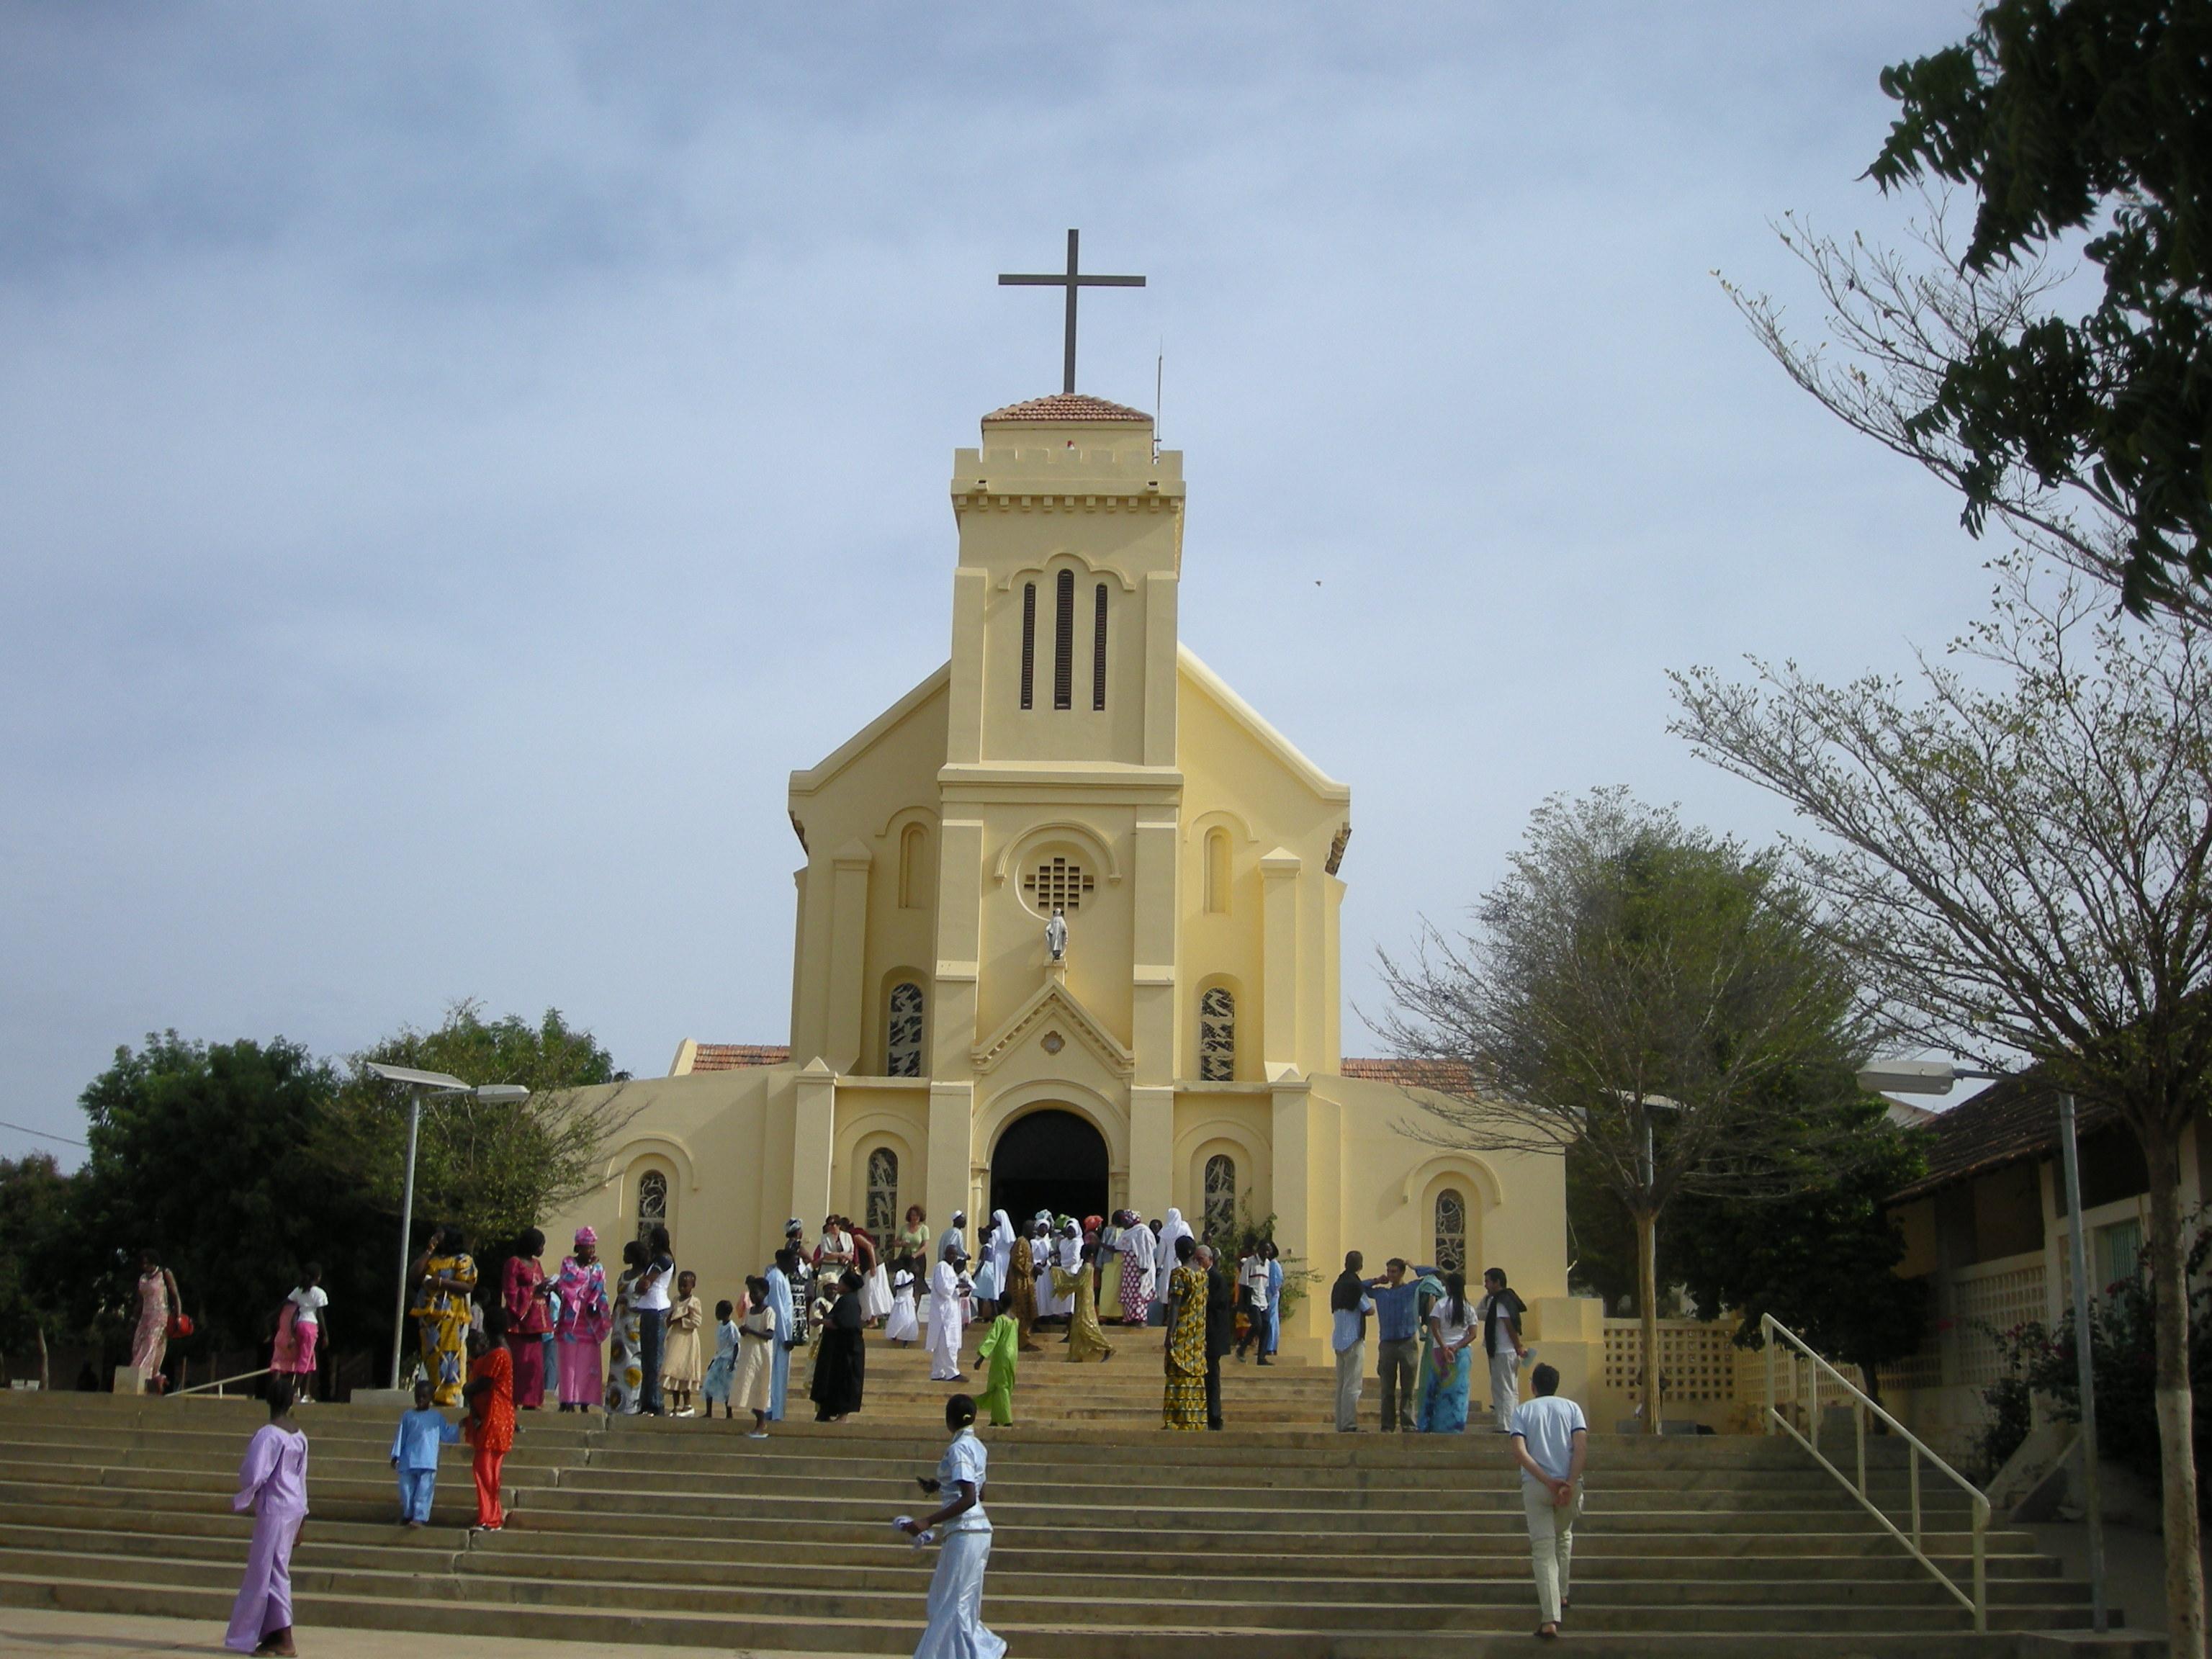 Coronavirus: L'église reporte toutes ses manifestations